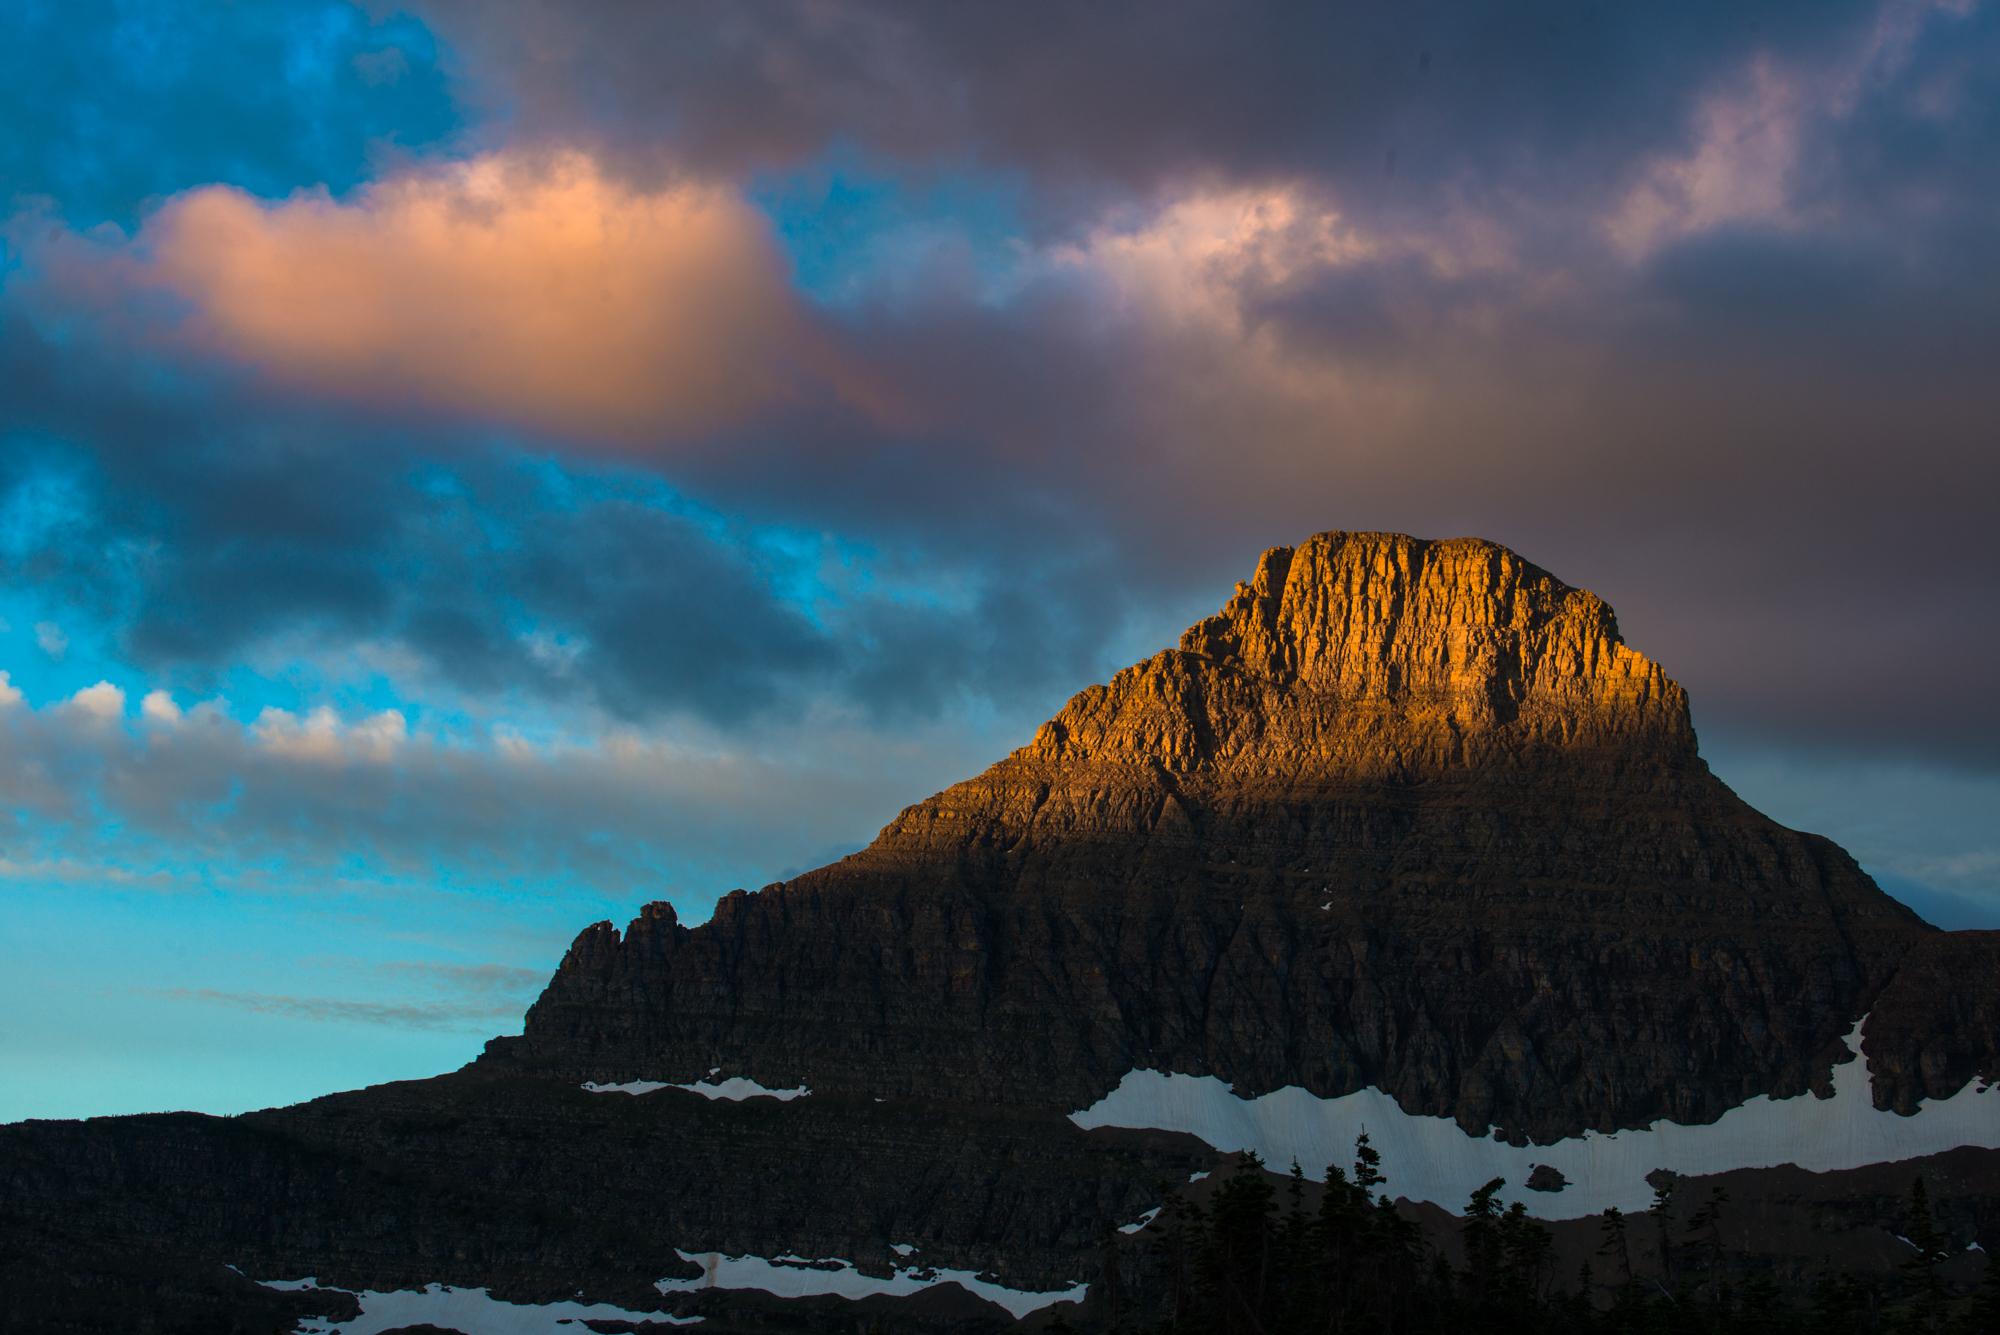 GlacierNP_072117._CVB5237.jpg